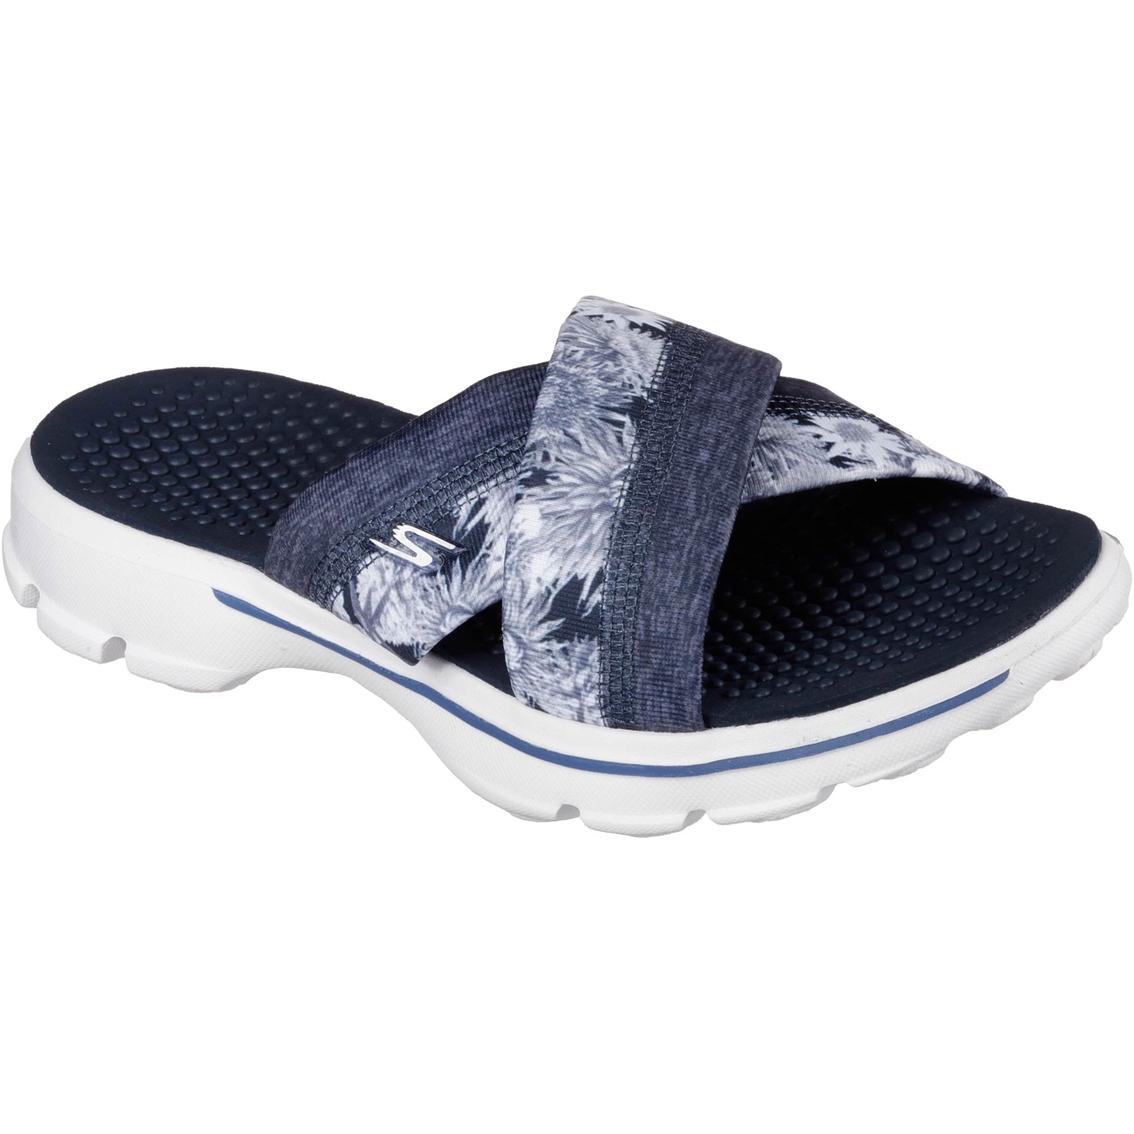 Skechers Women S Go Walk Fuji Sandals Flats Shoes